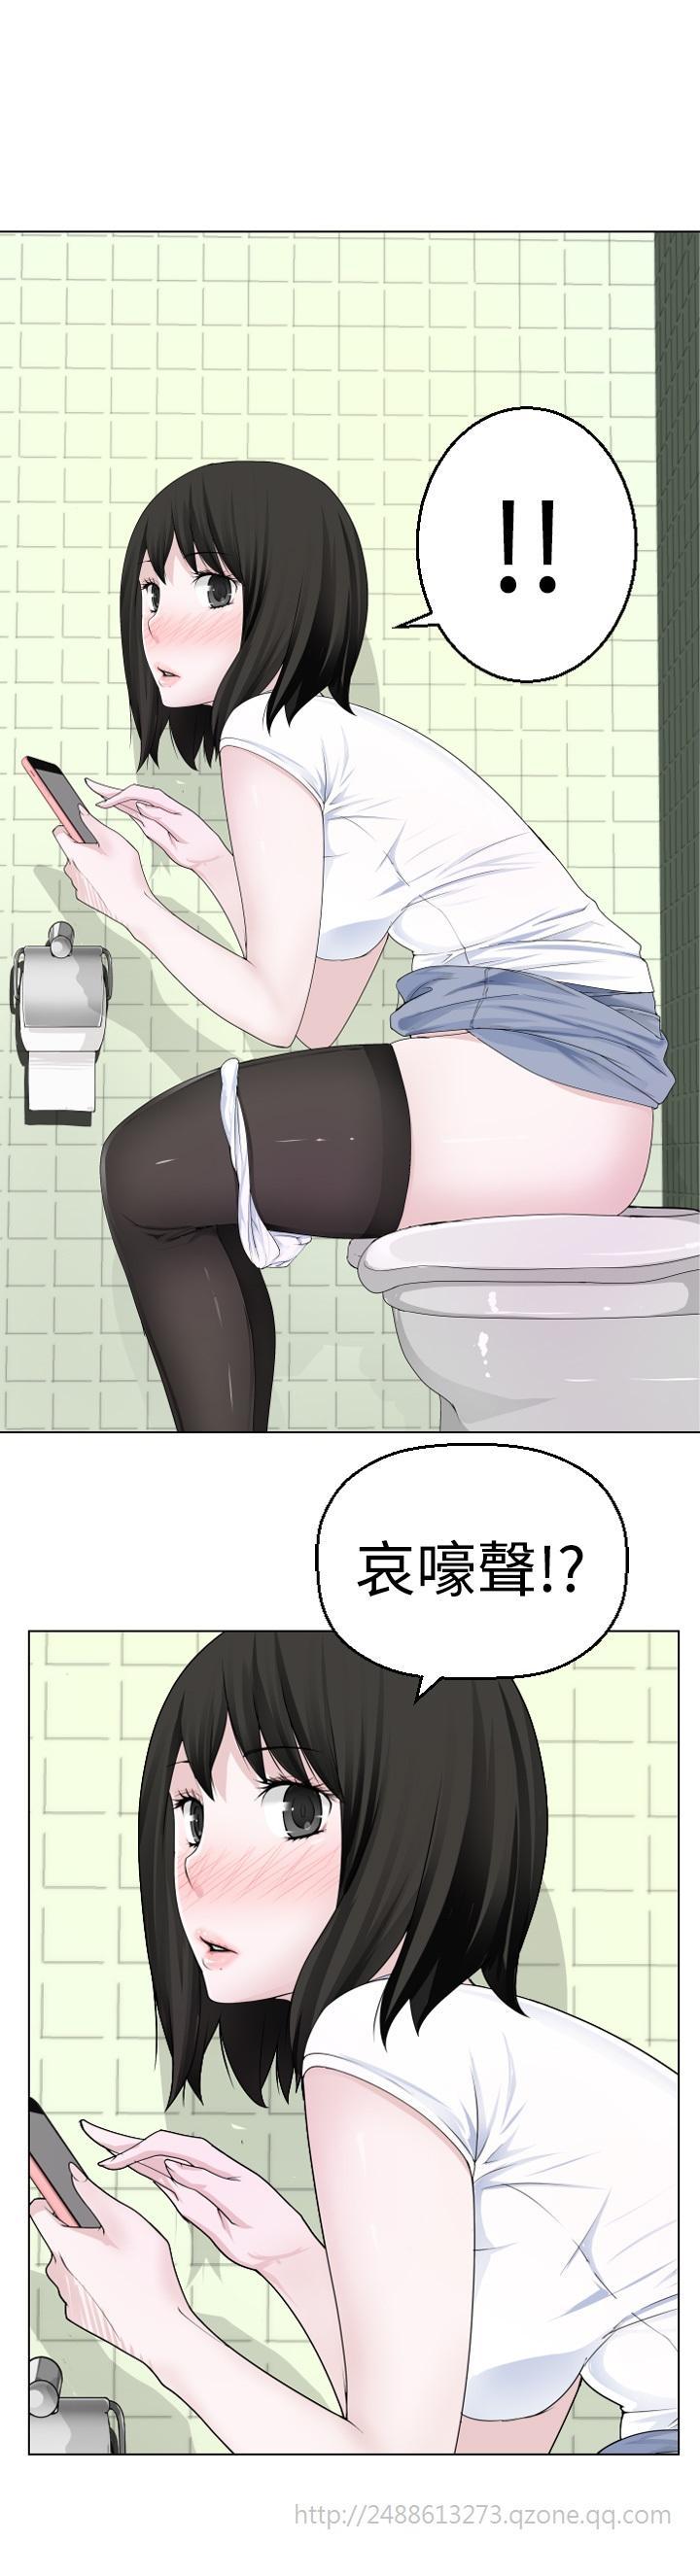 [SOSO] Franken Jo 为爱而生 法兰克赵 Ch.1~19 [Chinese]中文 243